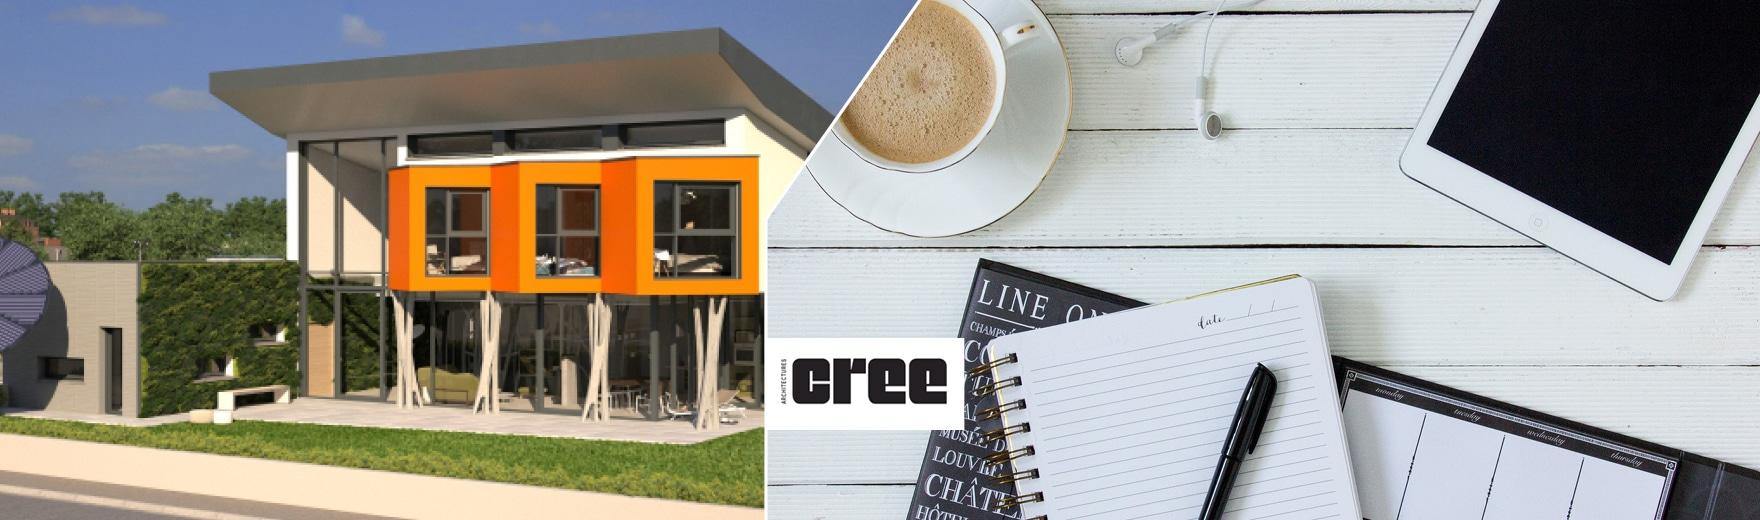 Architecture CREE 18 juin 2018